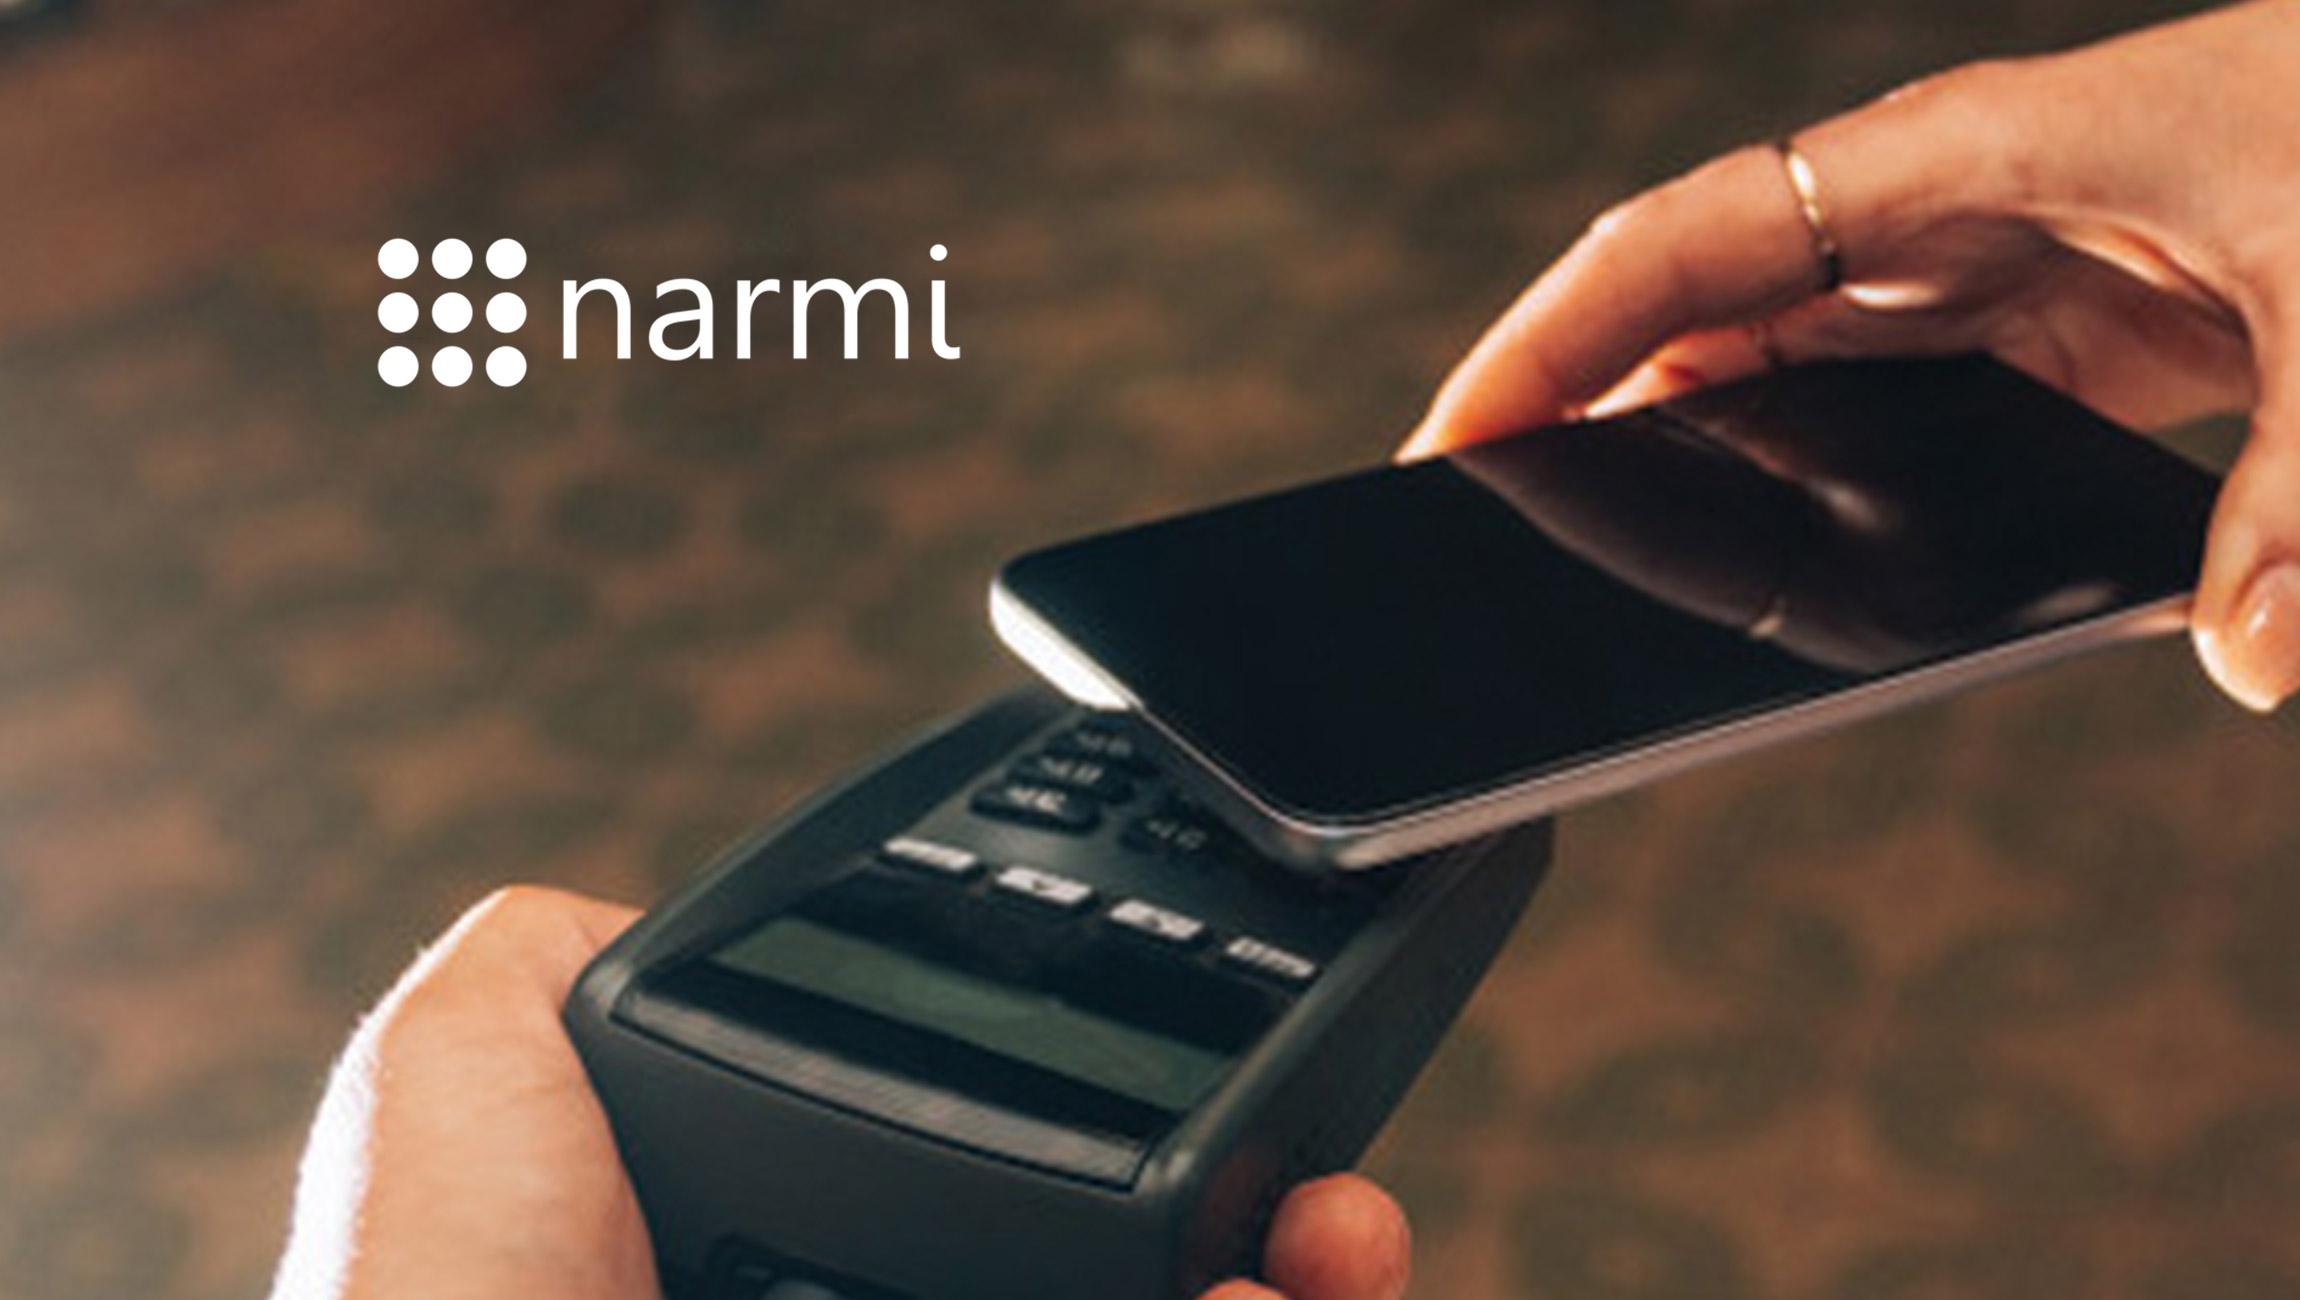 Digital banking tech startup Narmi raises $20.4m